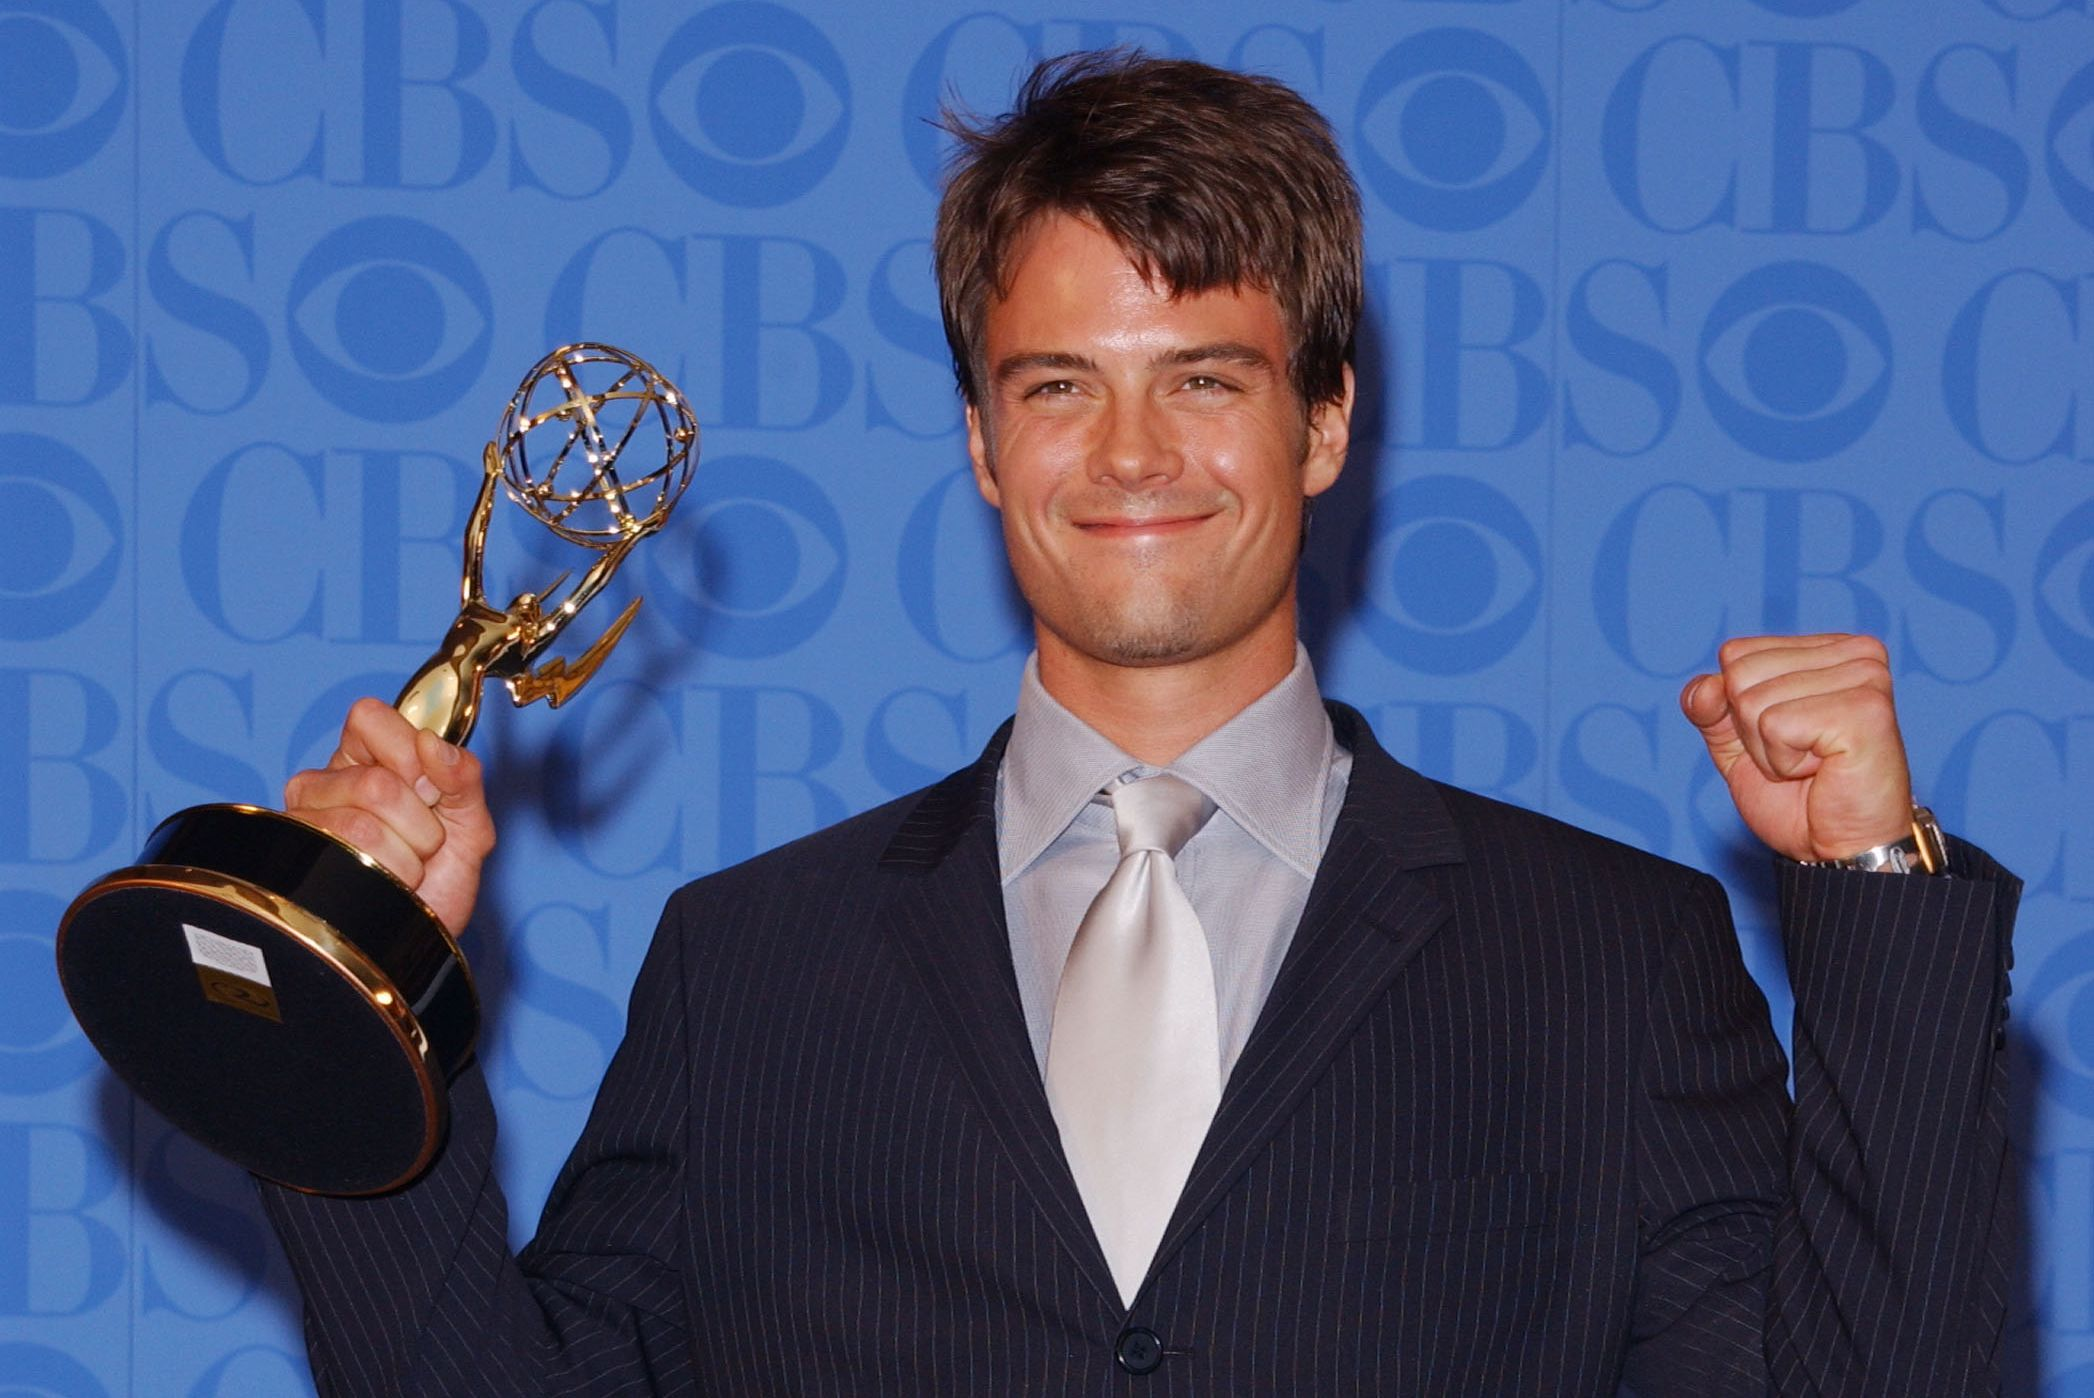 29th Annual Daytime Emmy Awards